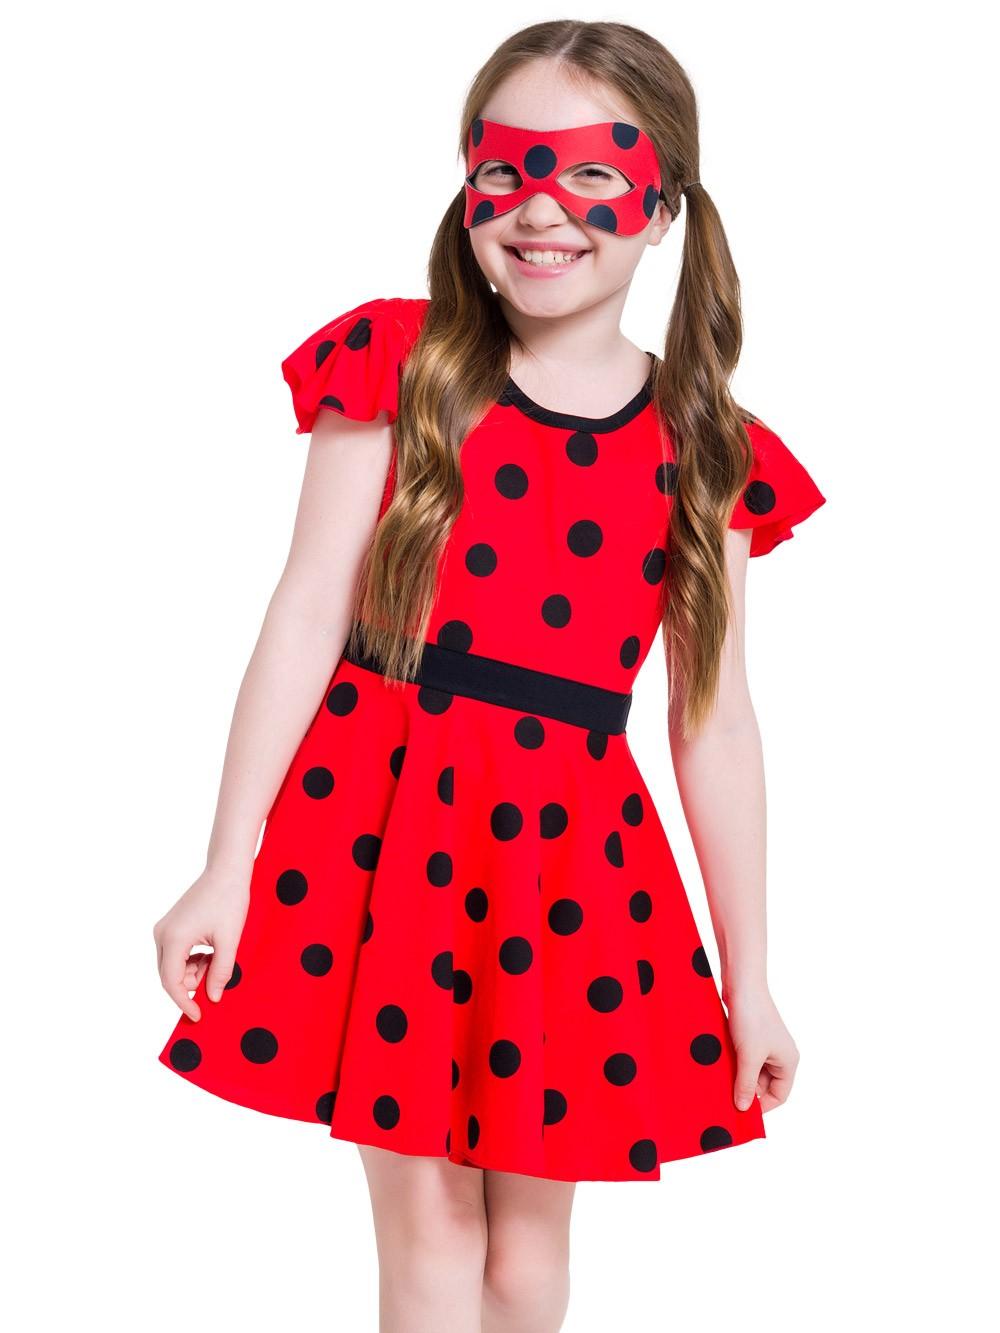 Camisola infantil lady bug menina manguinha mascara brinde